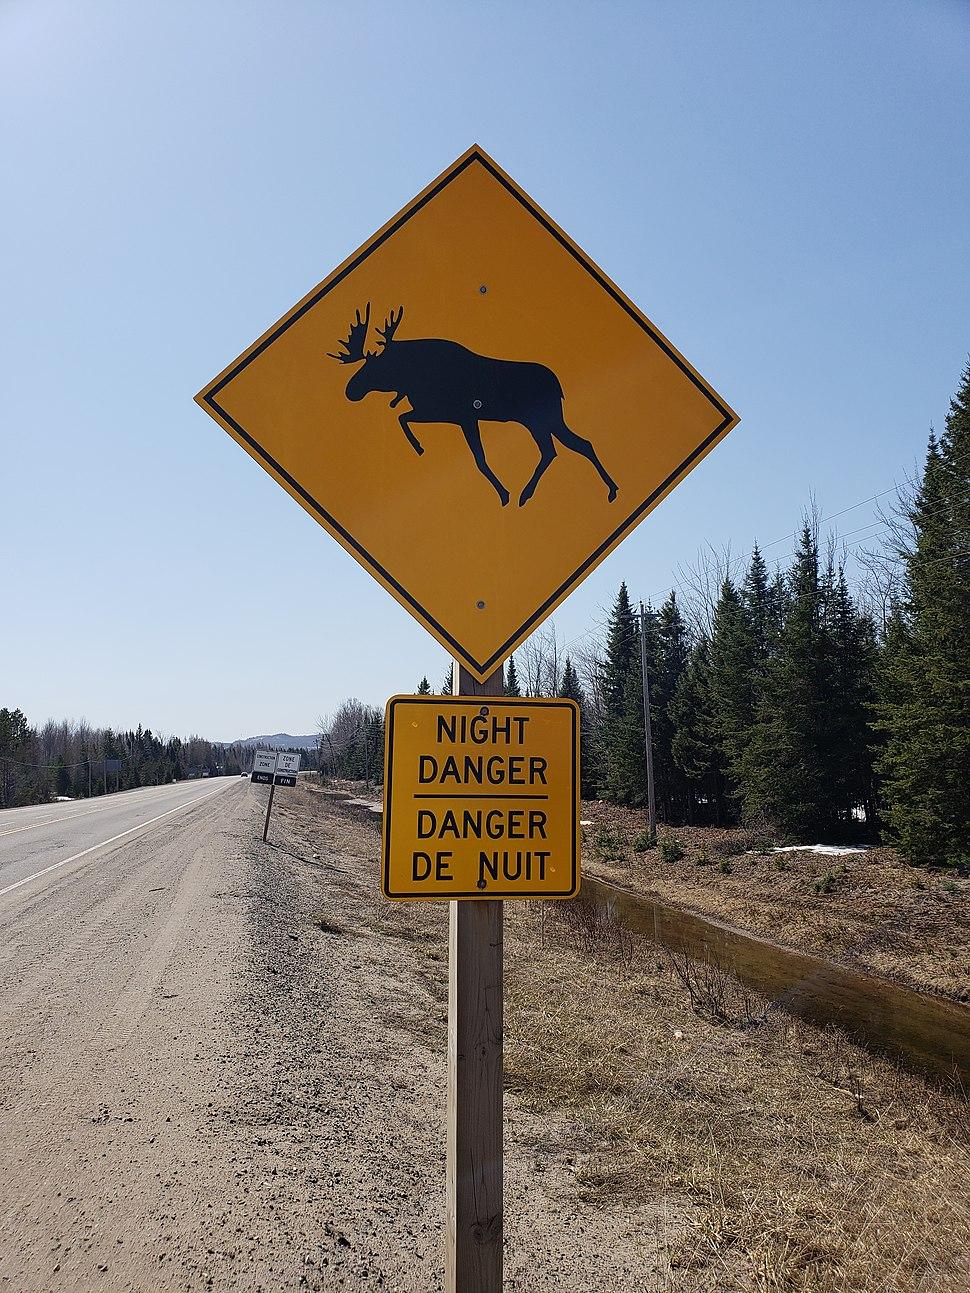 Moose crossing warning sign